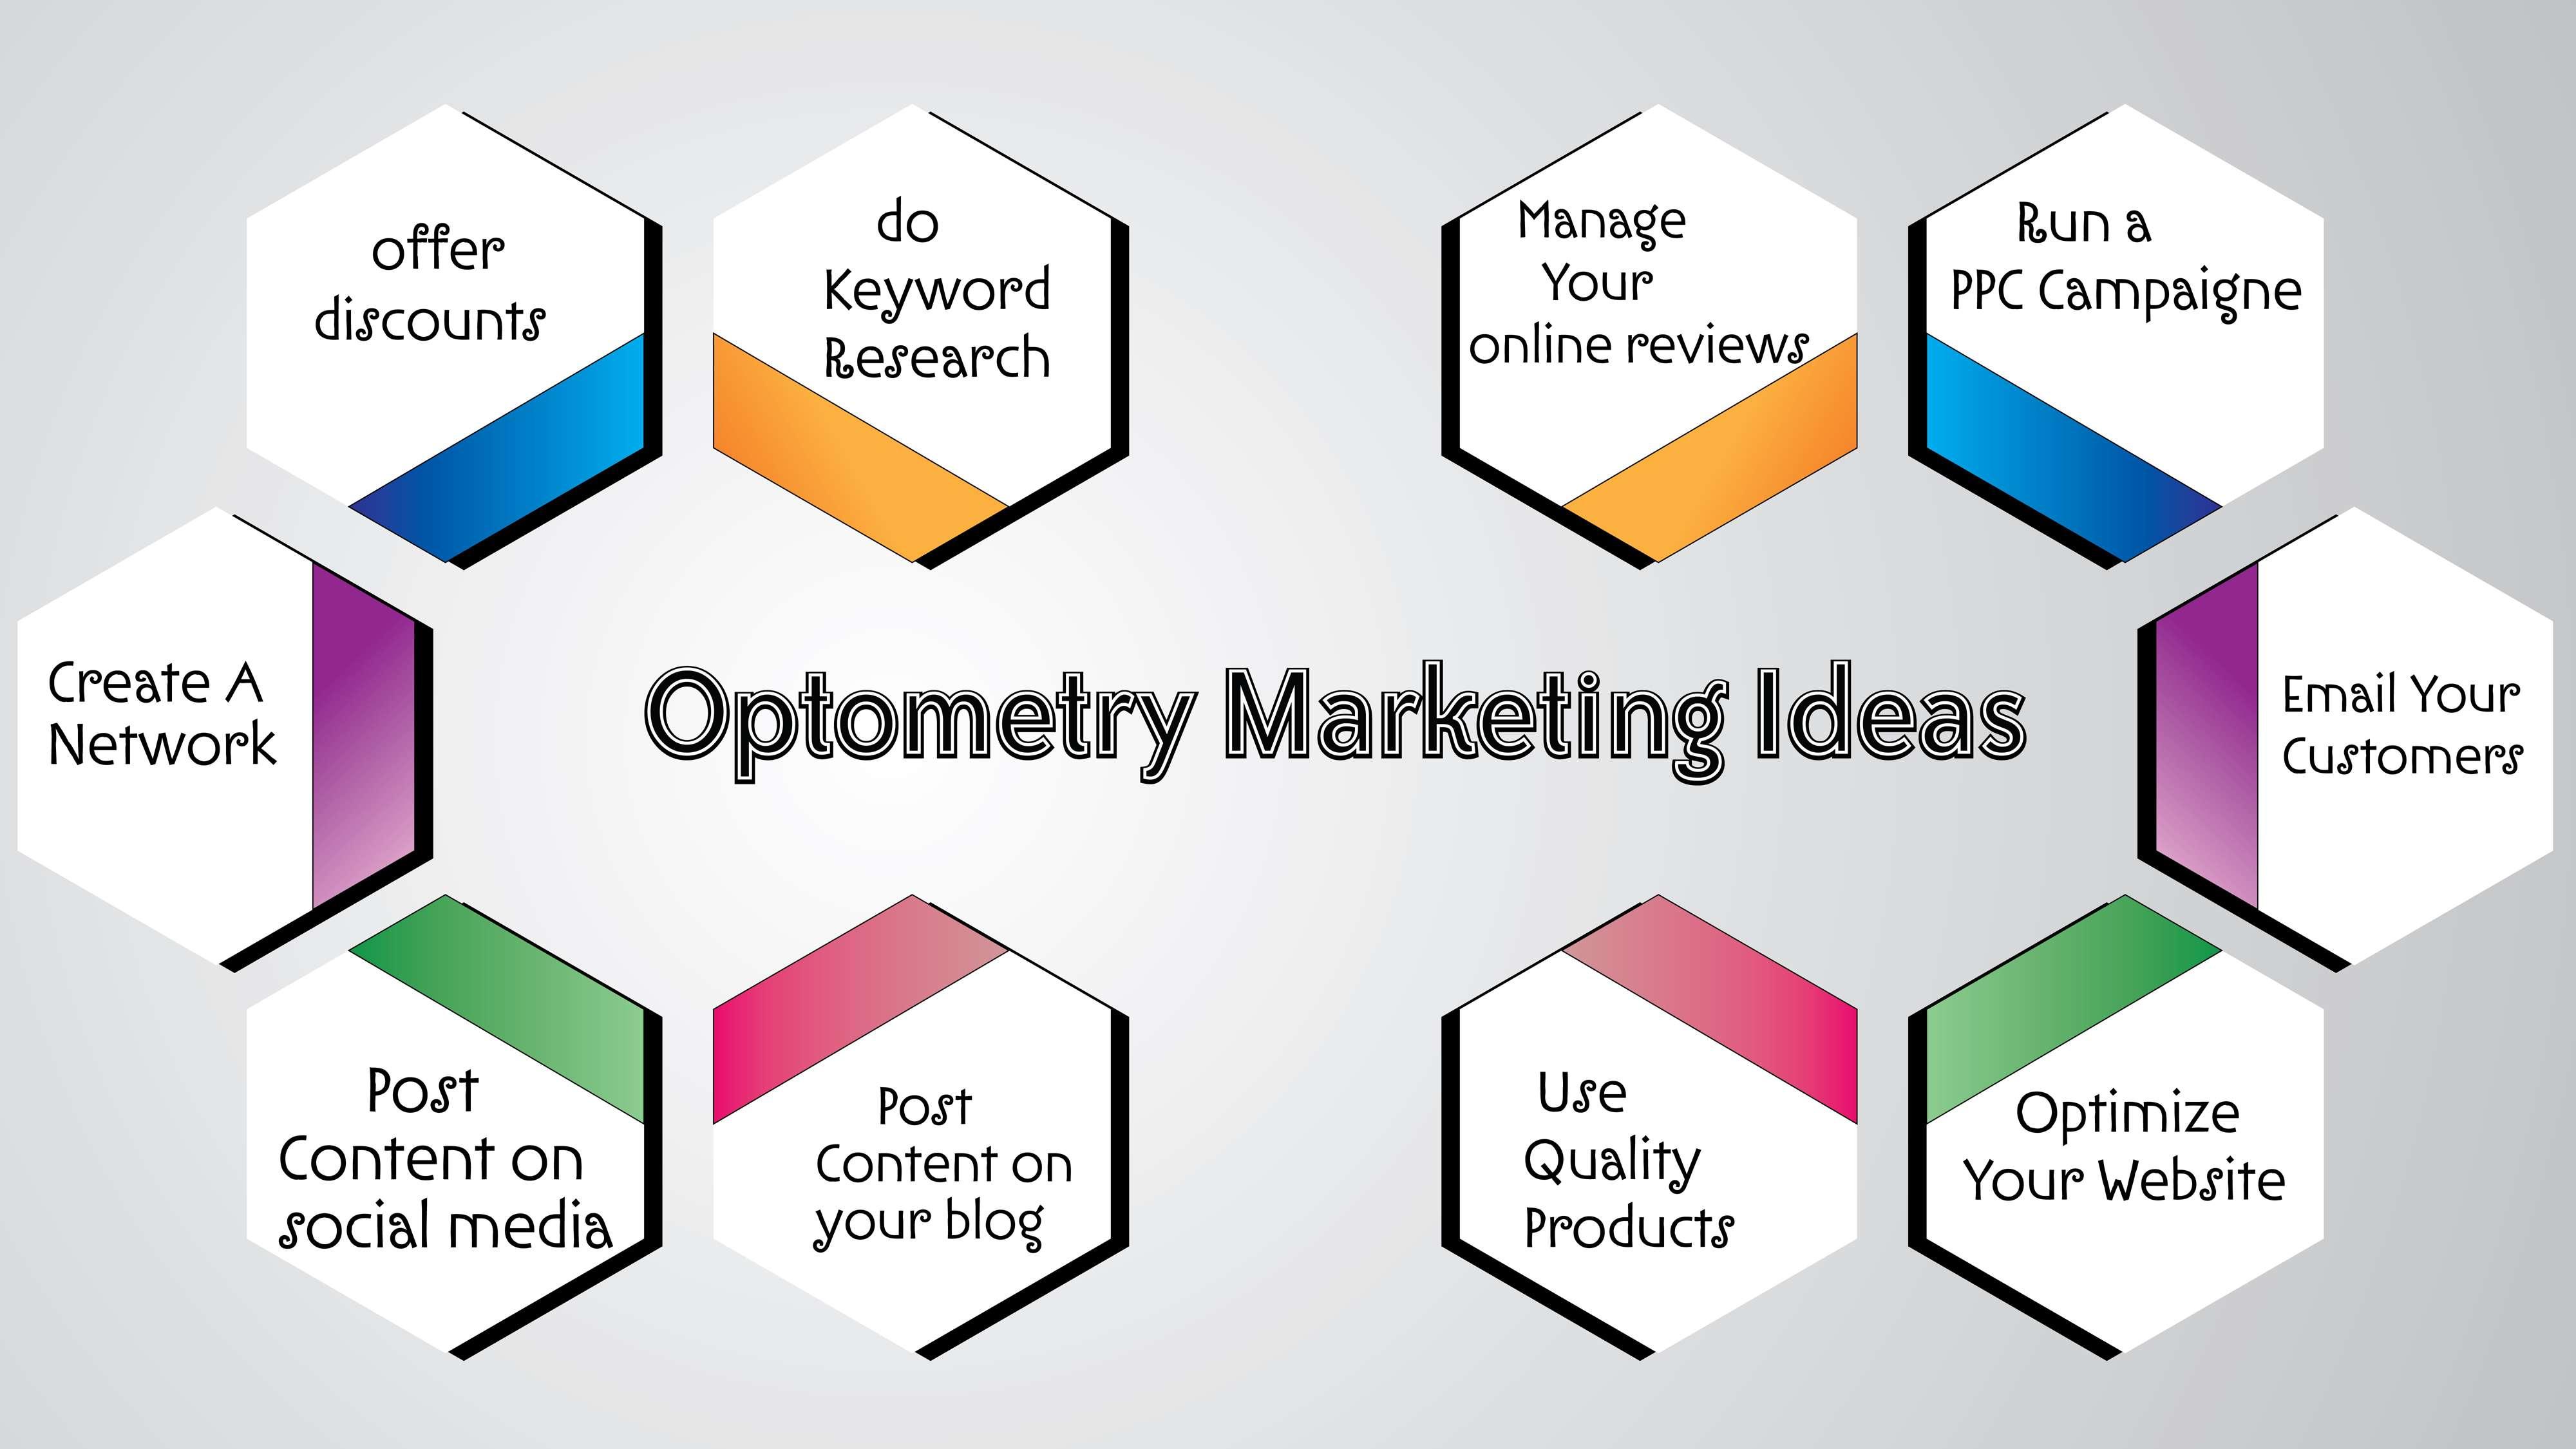 optometry marketing ideas